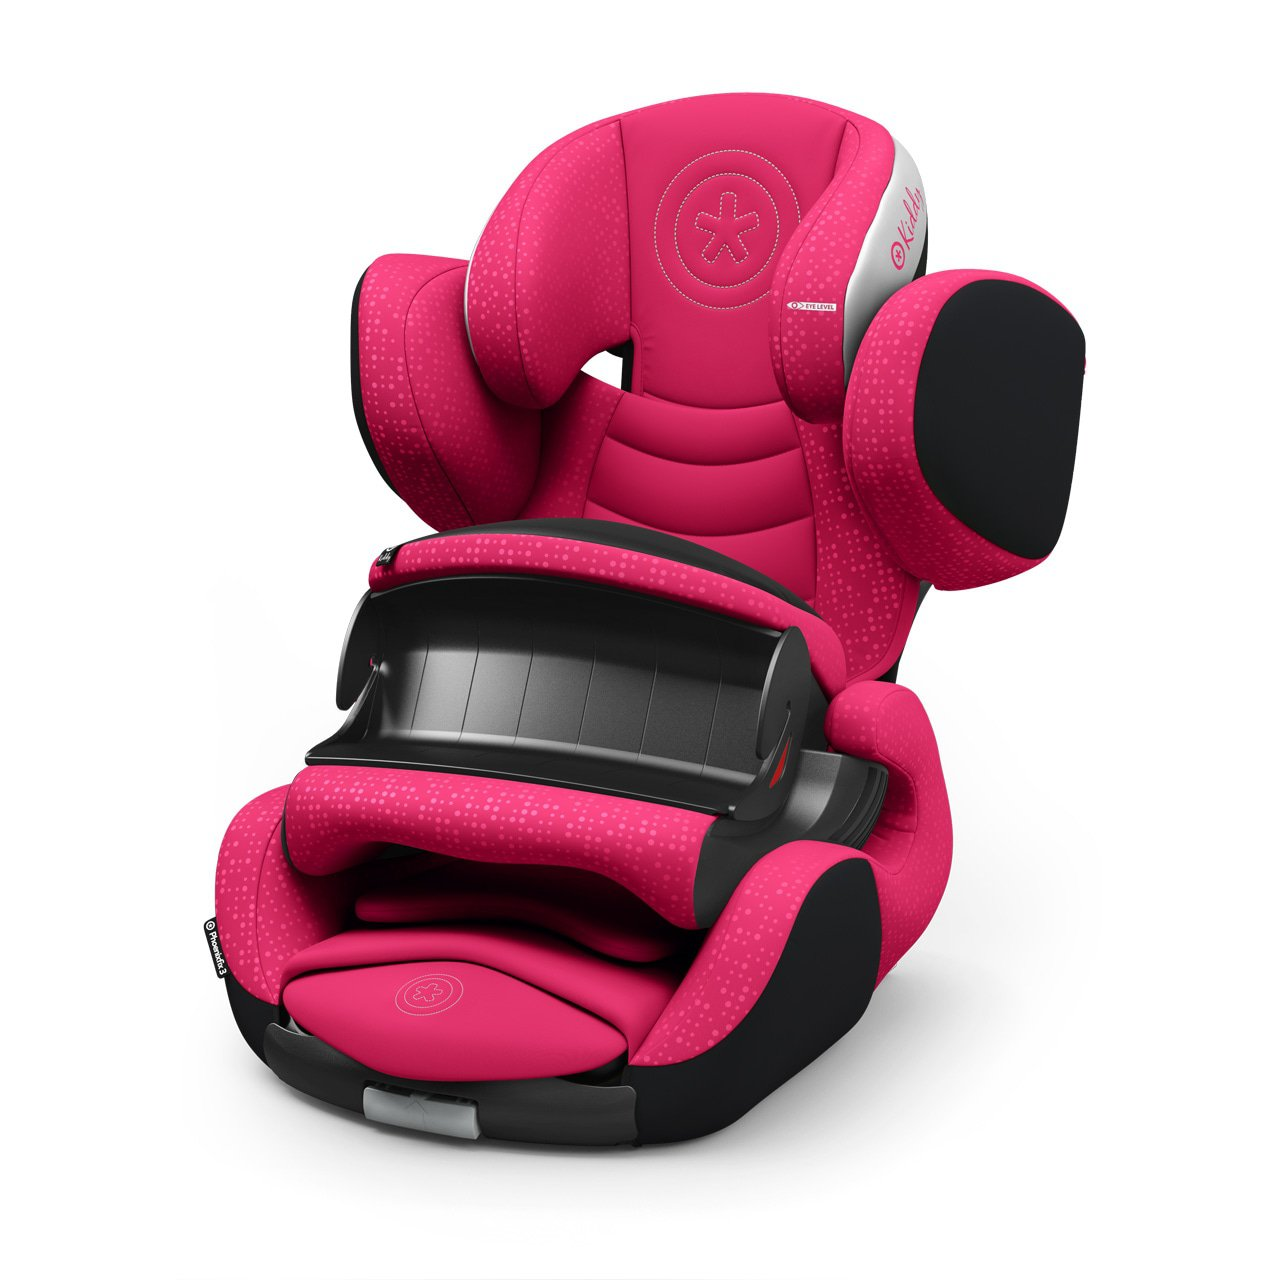 Kiddy_Phoenixfix_3_Rubin_Pink_babyhuys